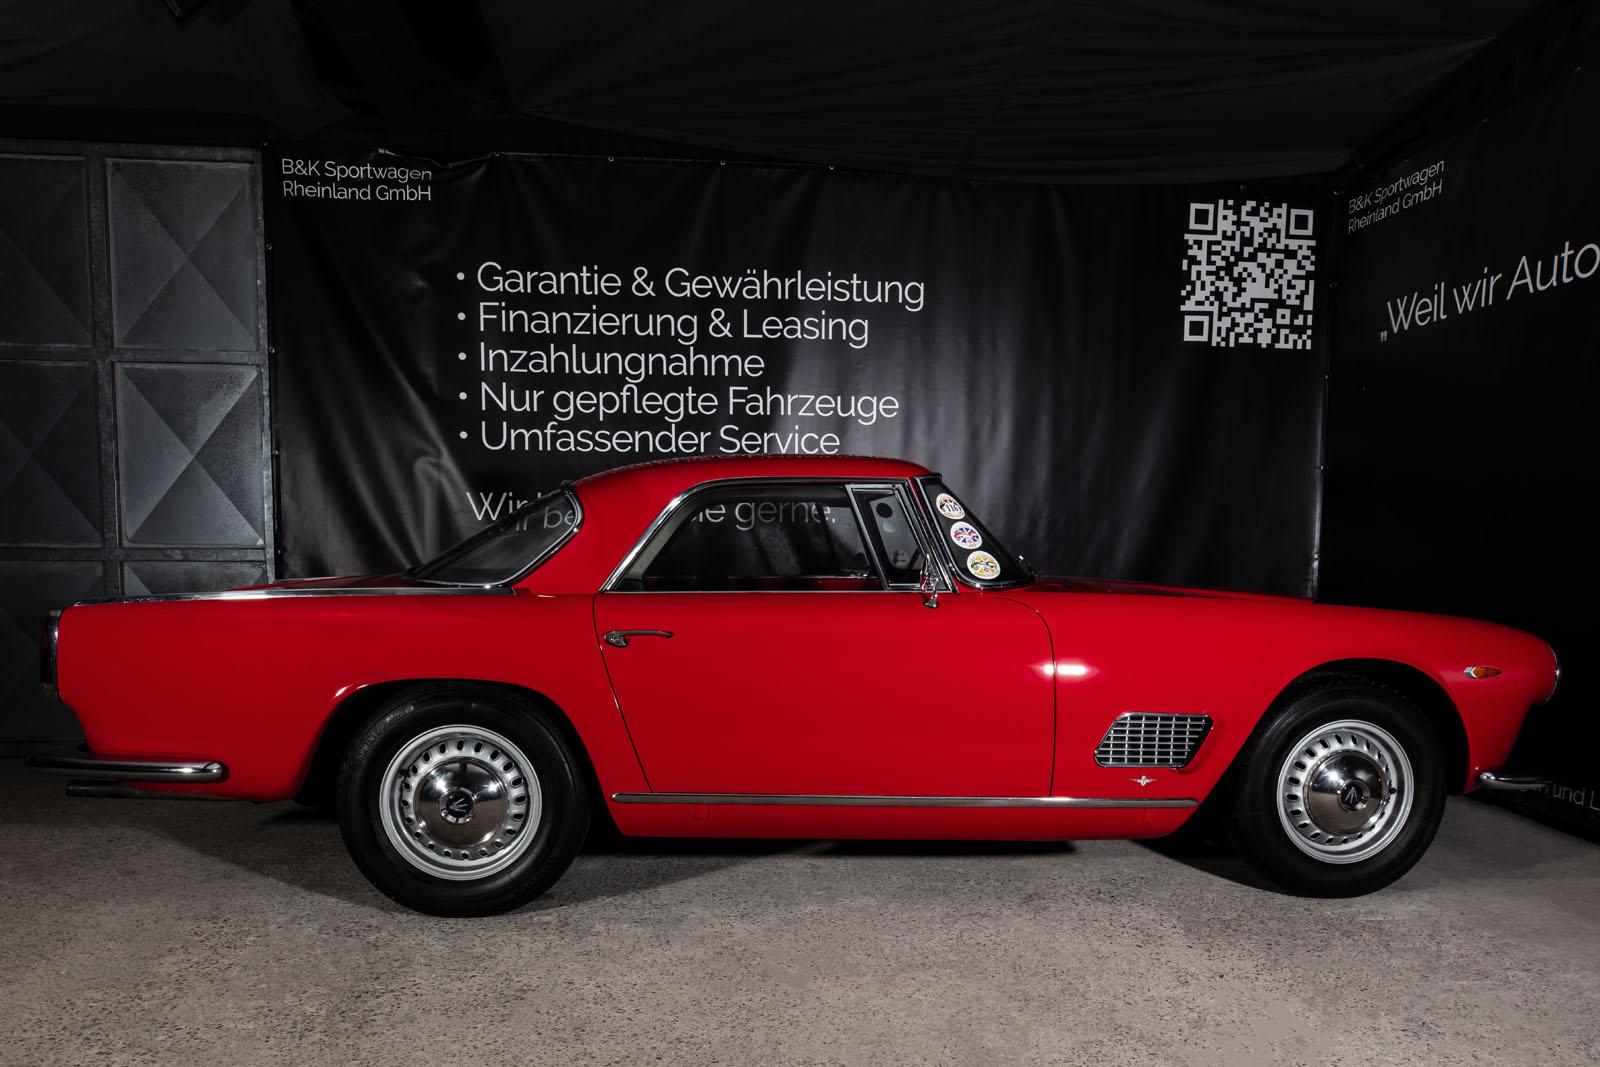 Maserati_3500_GT_Rot_Black_MAS-1742_15_w